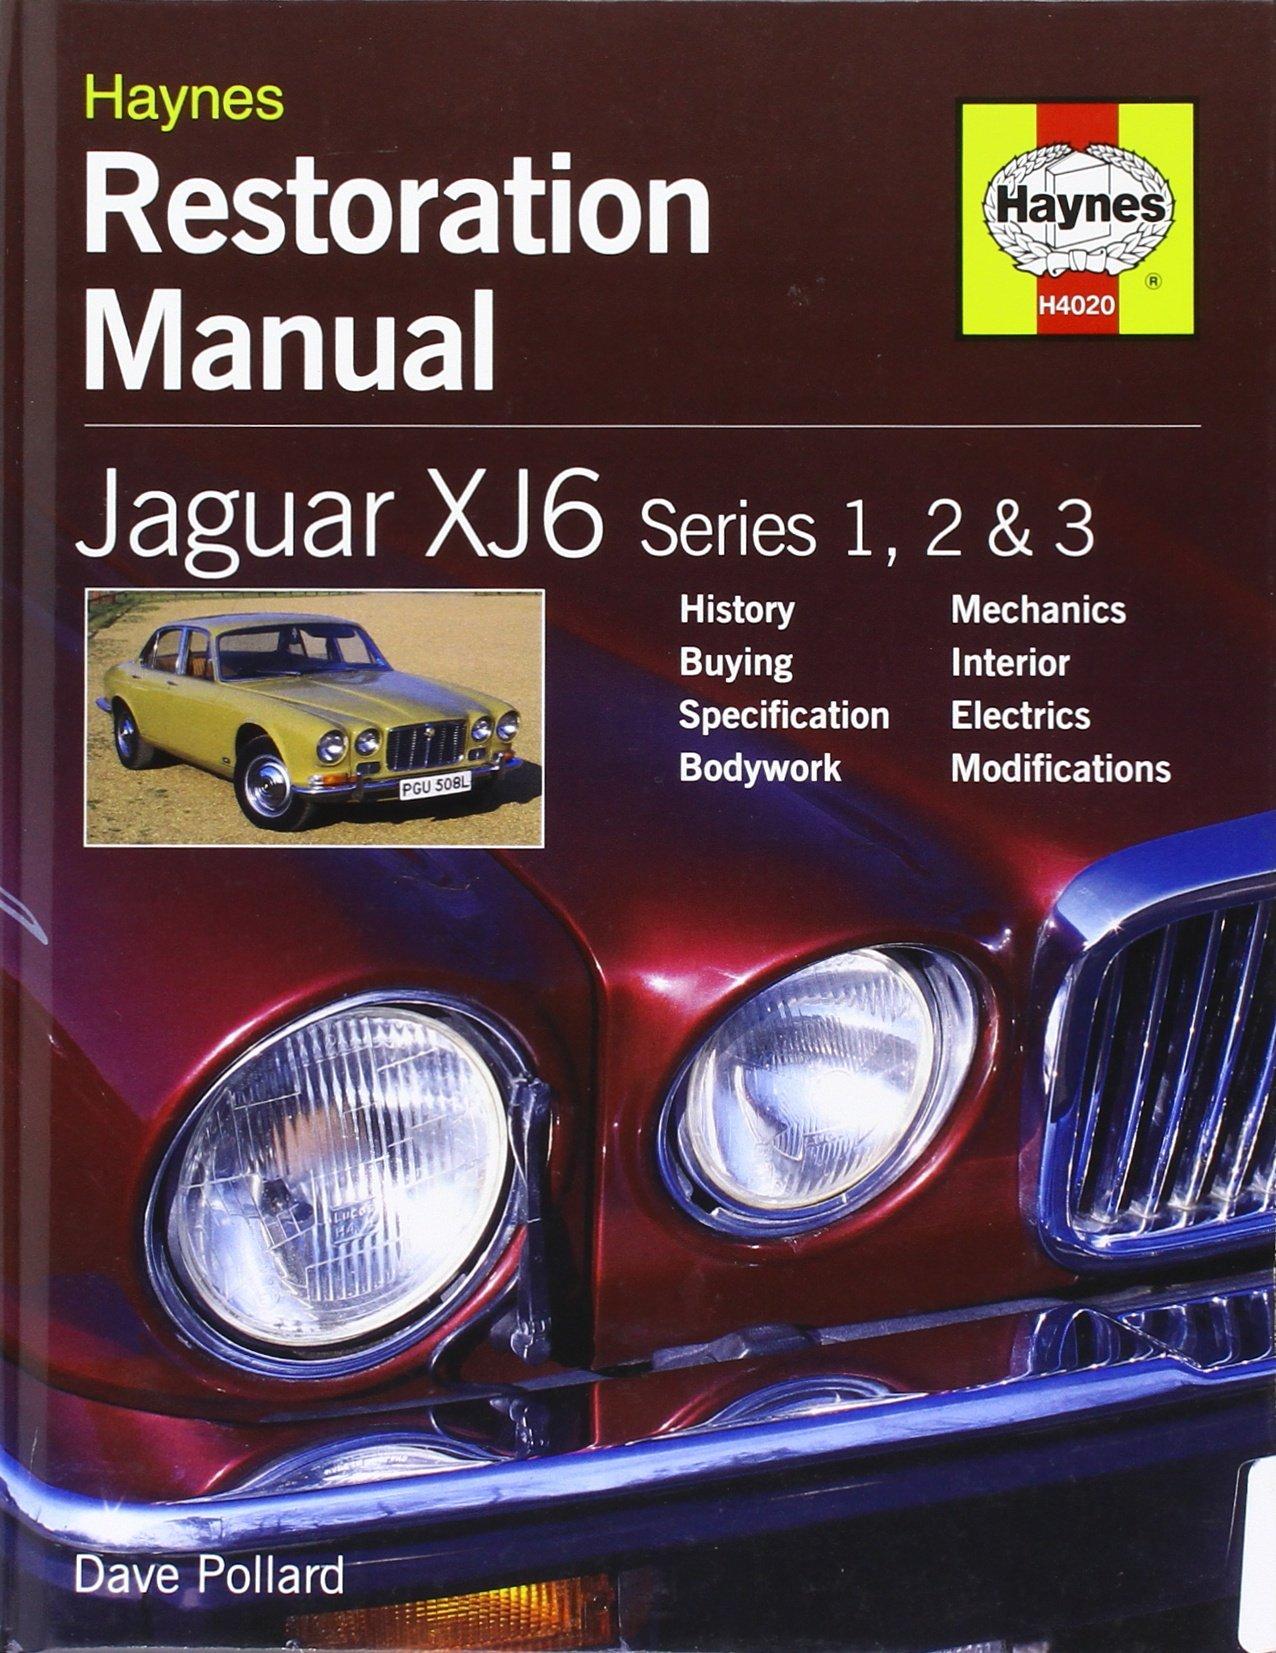 Restoration Manual Jaguar Xj6 Series 123: Amazon.co.uk: Dave Pollard, Steve  Rendle: 9780857337887: Books